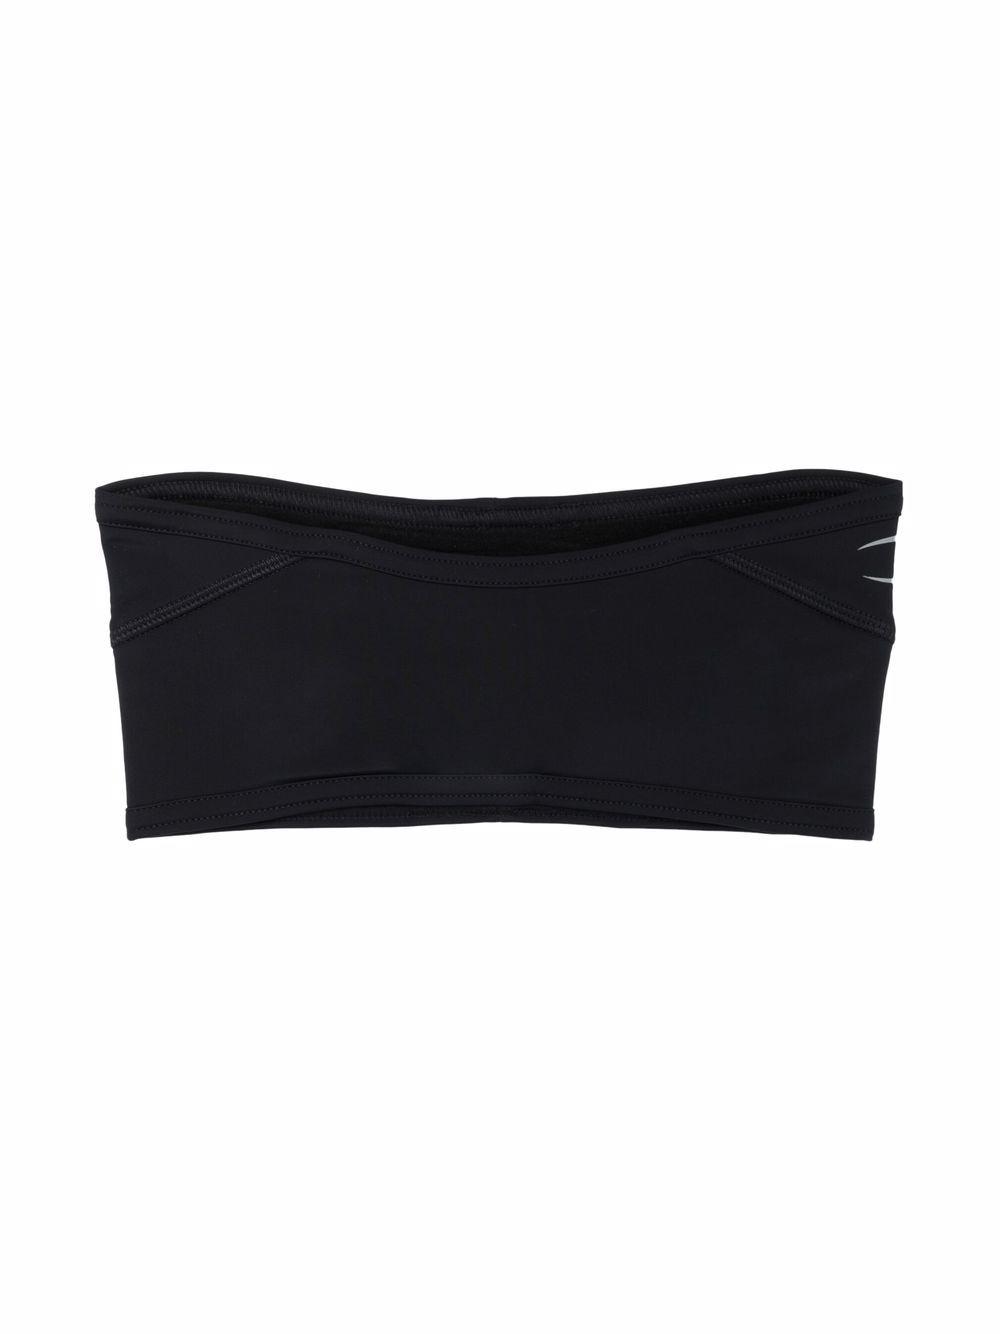 fascia con logo unisex nera MARINE SERRE | Mixed | A124FW21X00